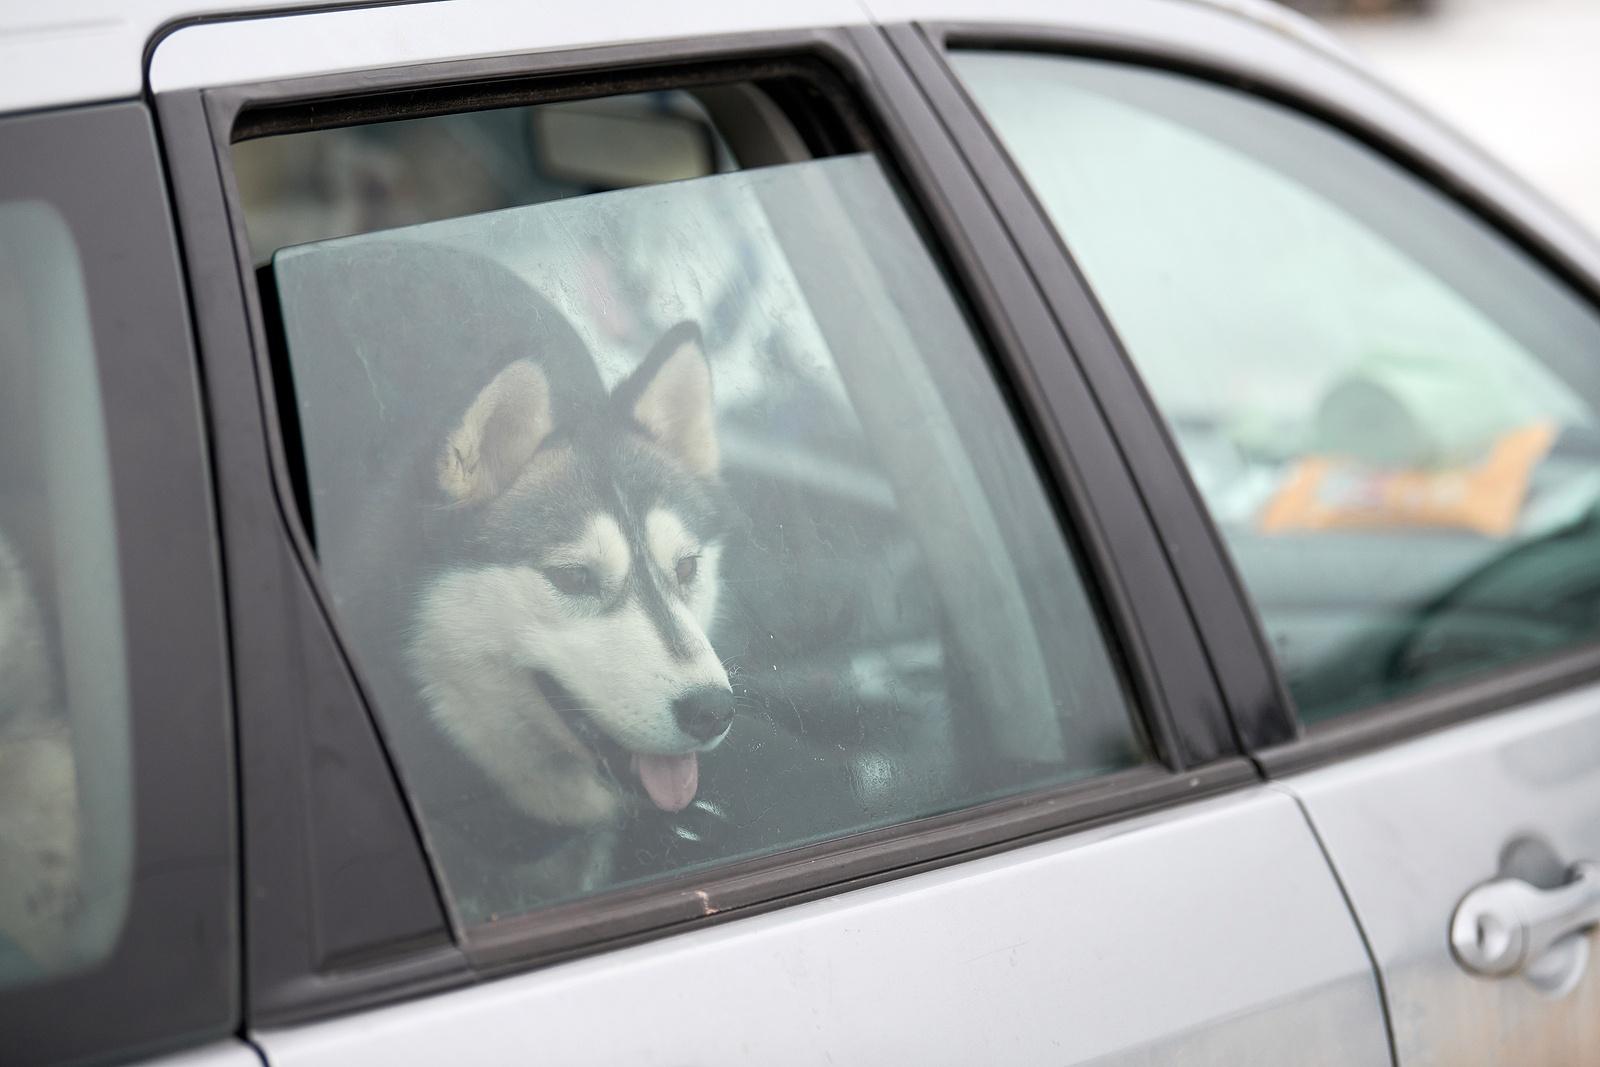 Husky Sled Dog In Car, Travel Pet. Dog Locked Inside Car, Lookin